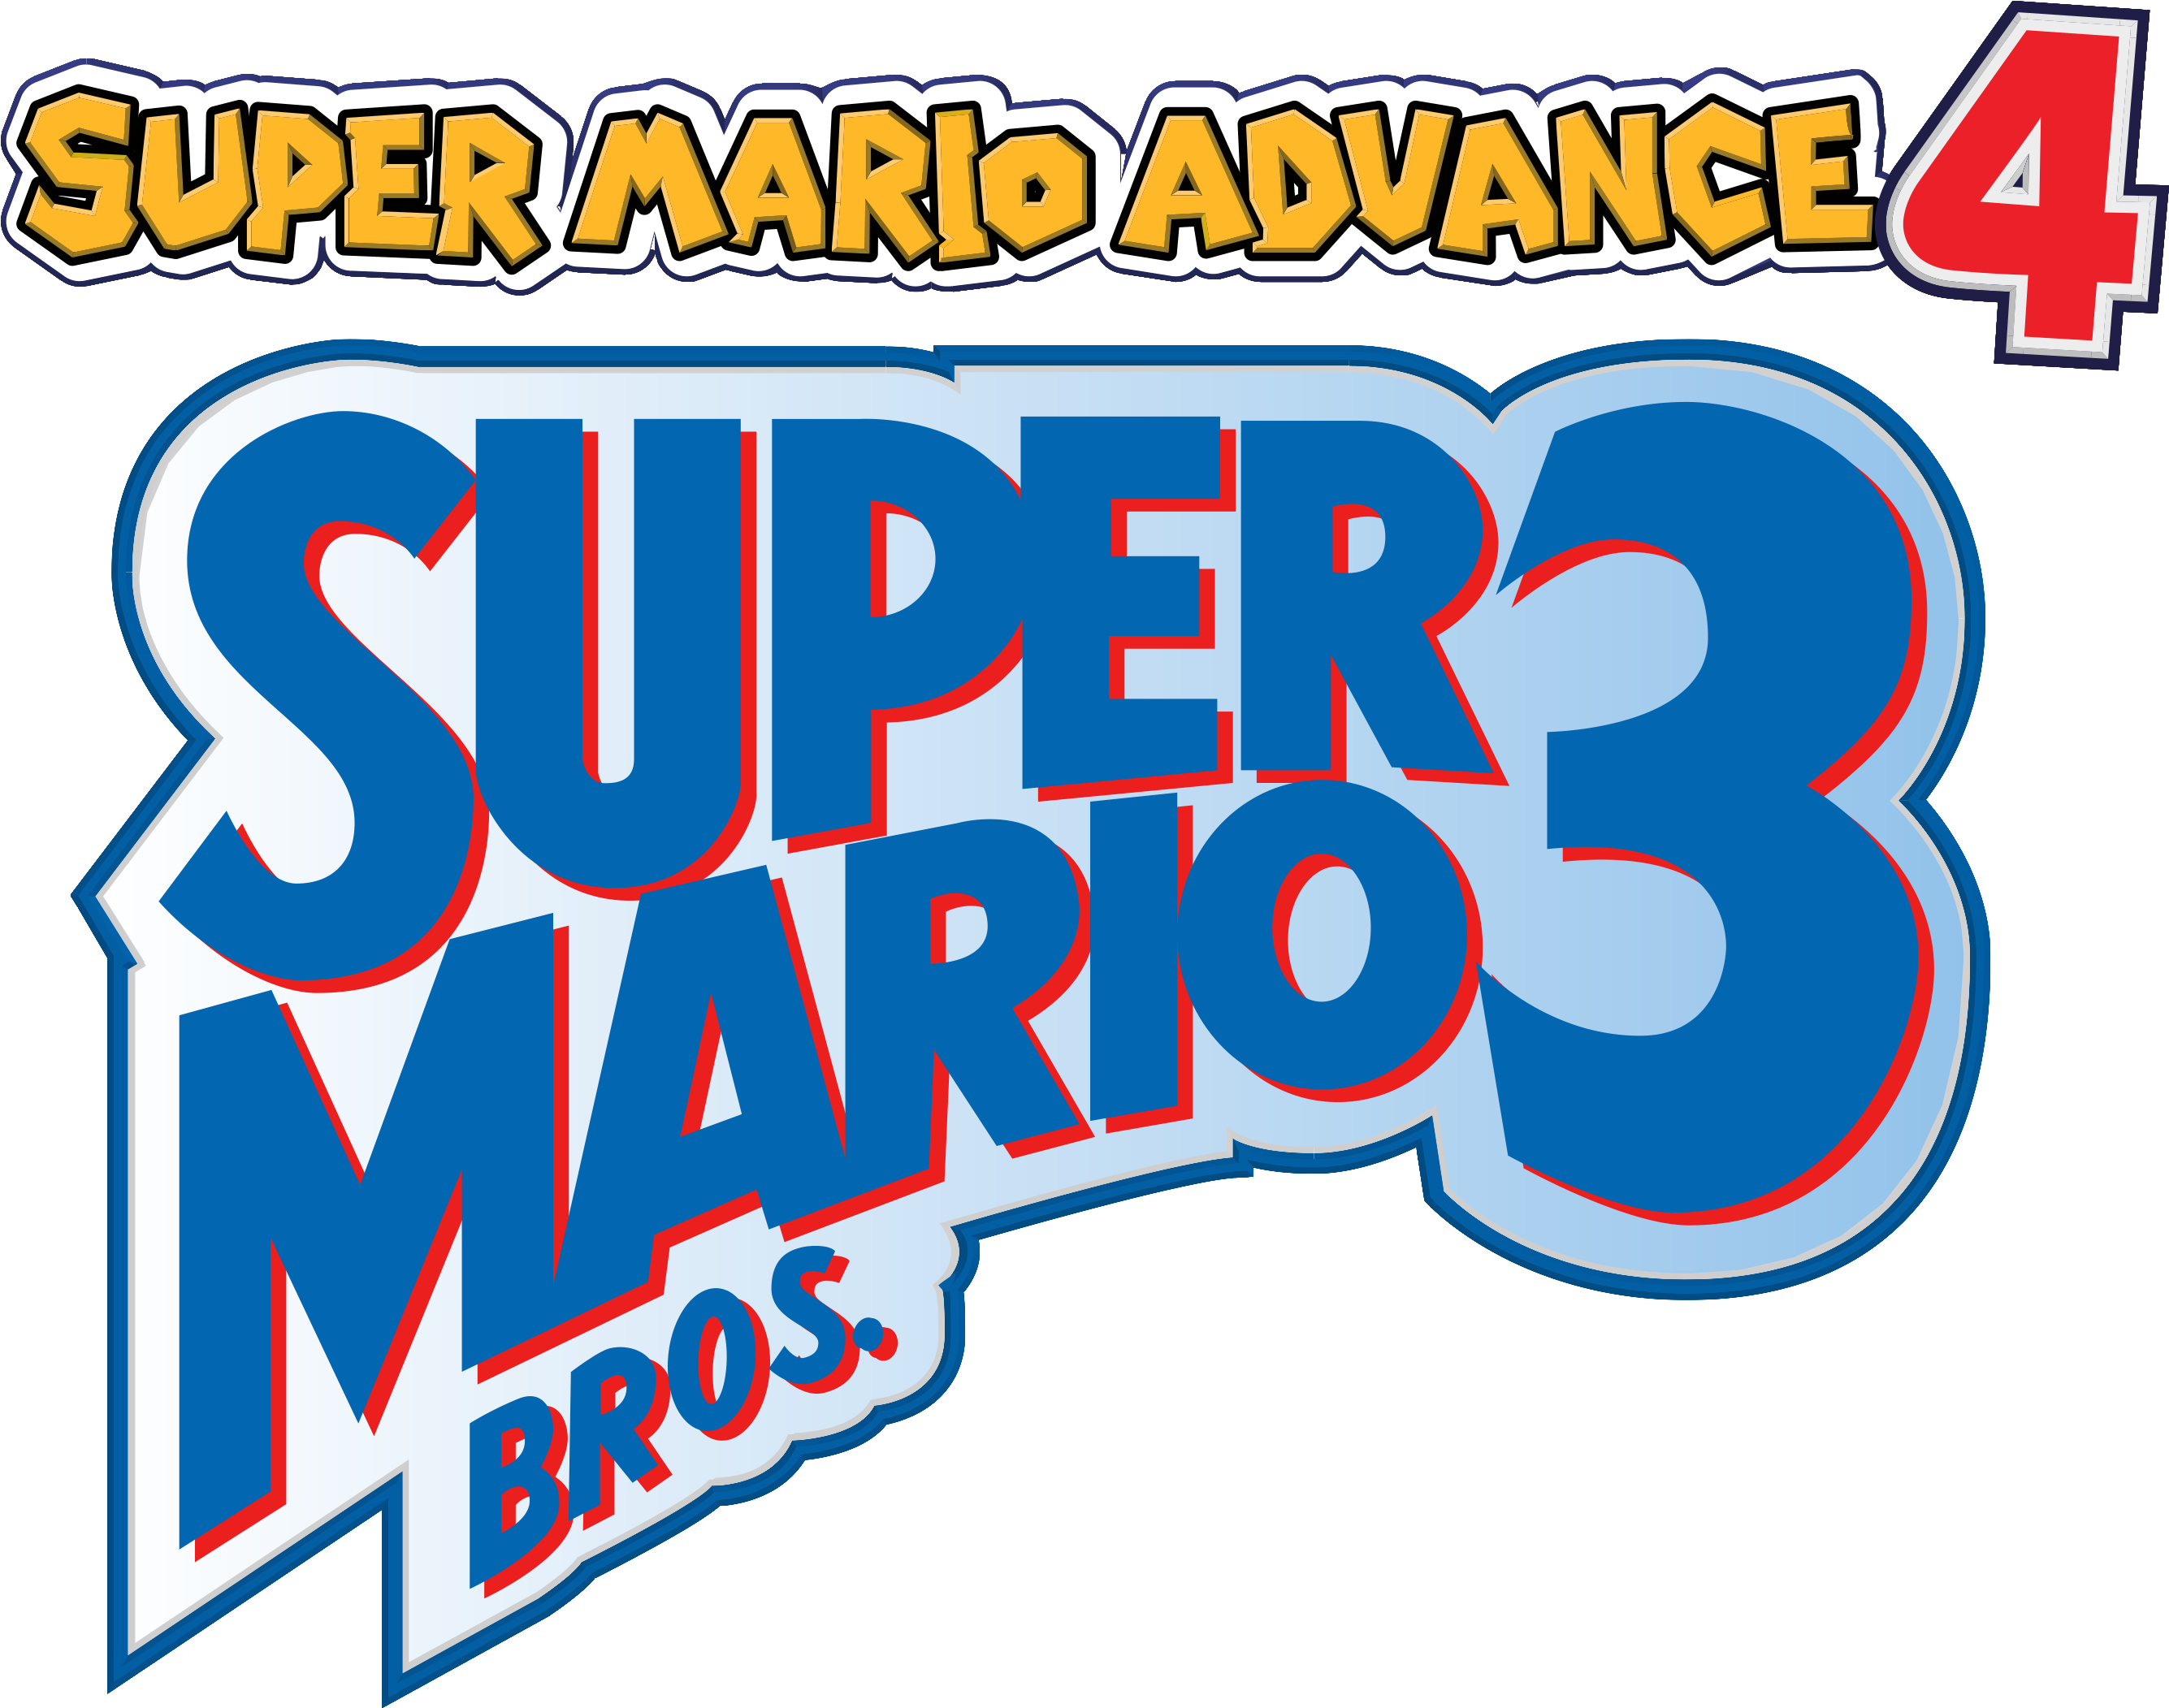 Download Clear Logo Super Mario Advance Super Mario Bros 3 Png